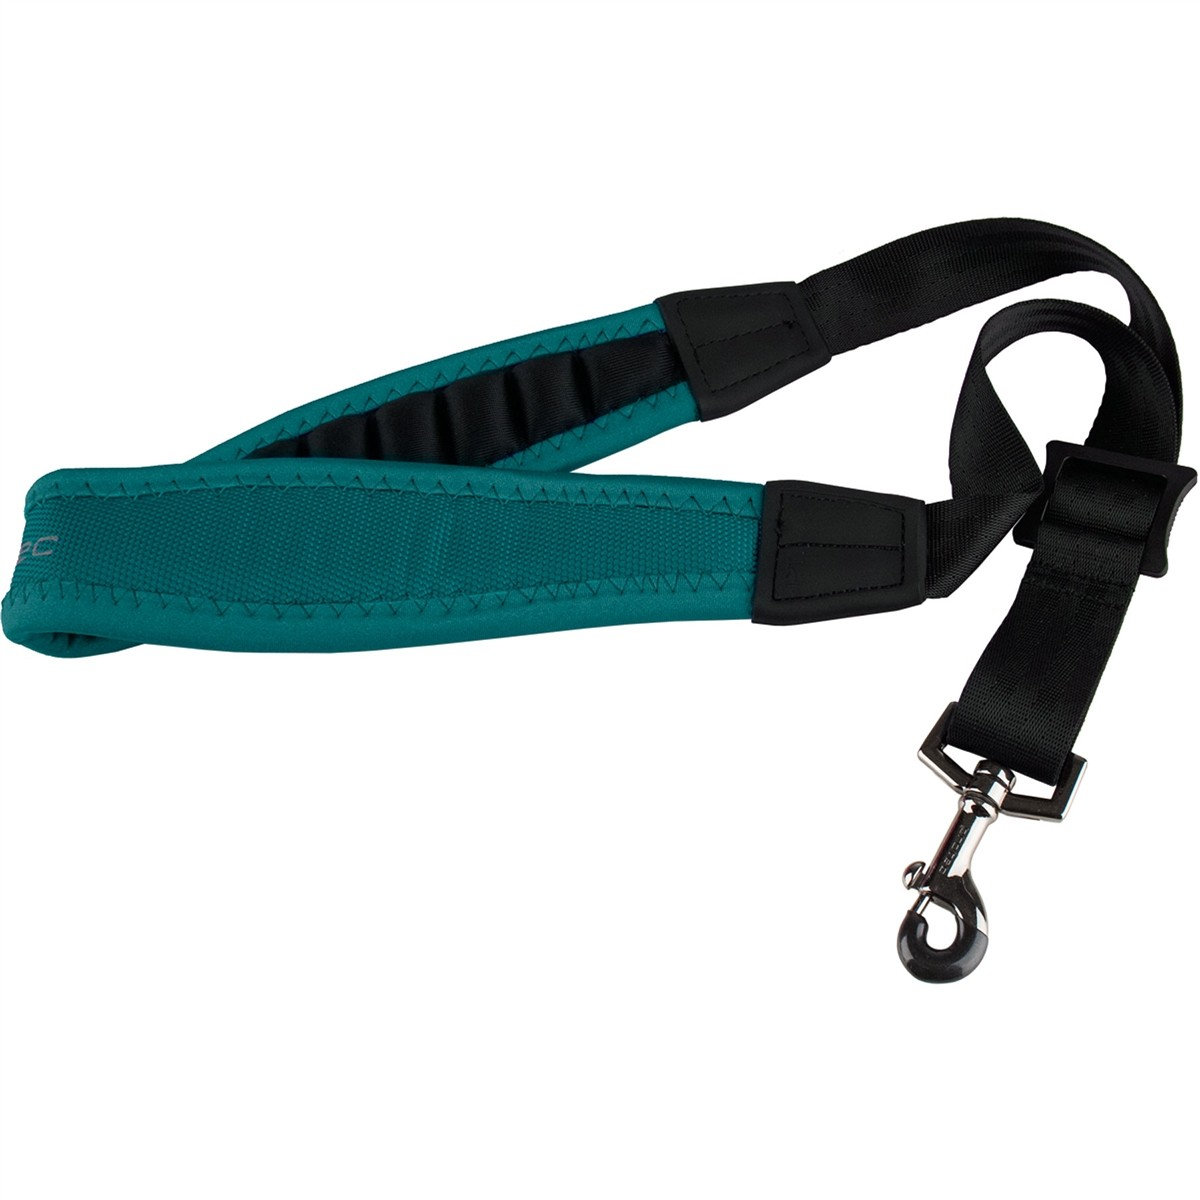 Protec 22″ (Regular) Ballistic Neoprene Less-Stress Saxophone Neck Strap (Teal Blue NLS310MTB)